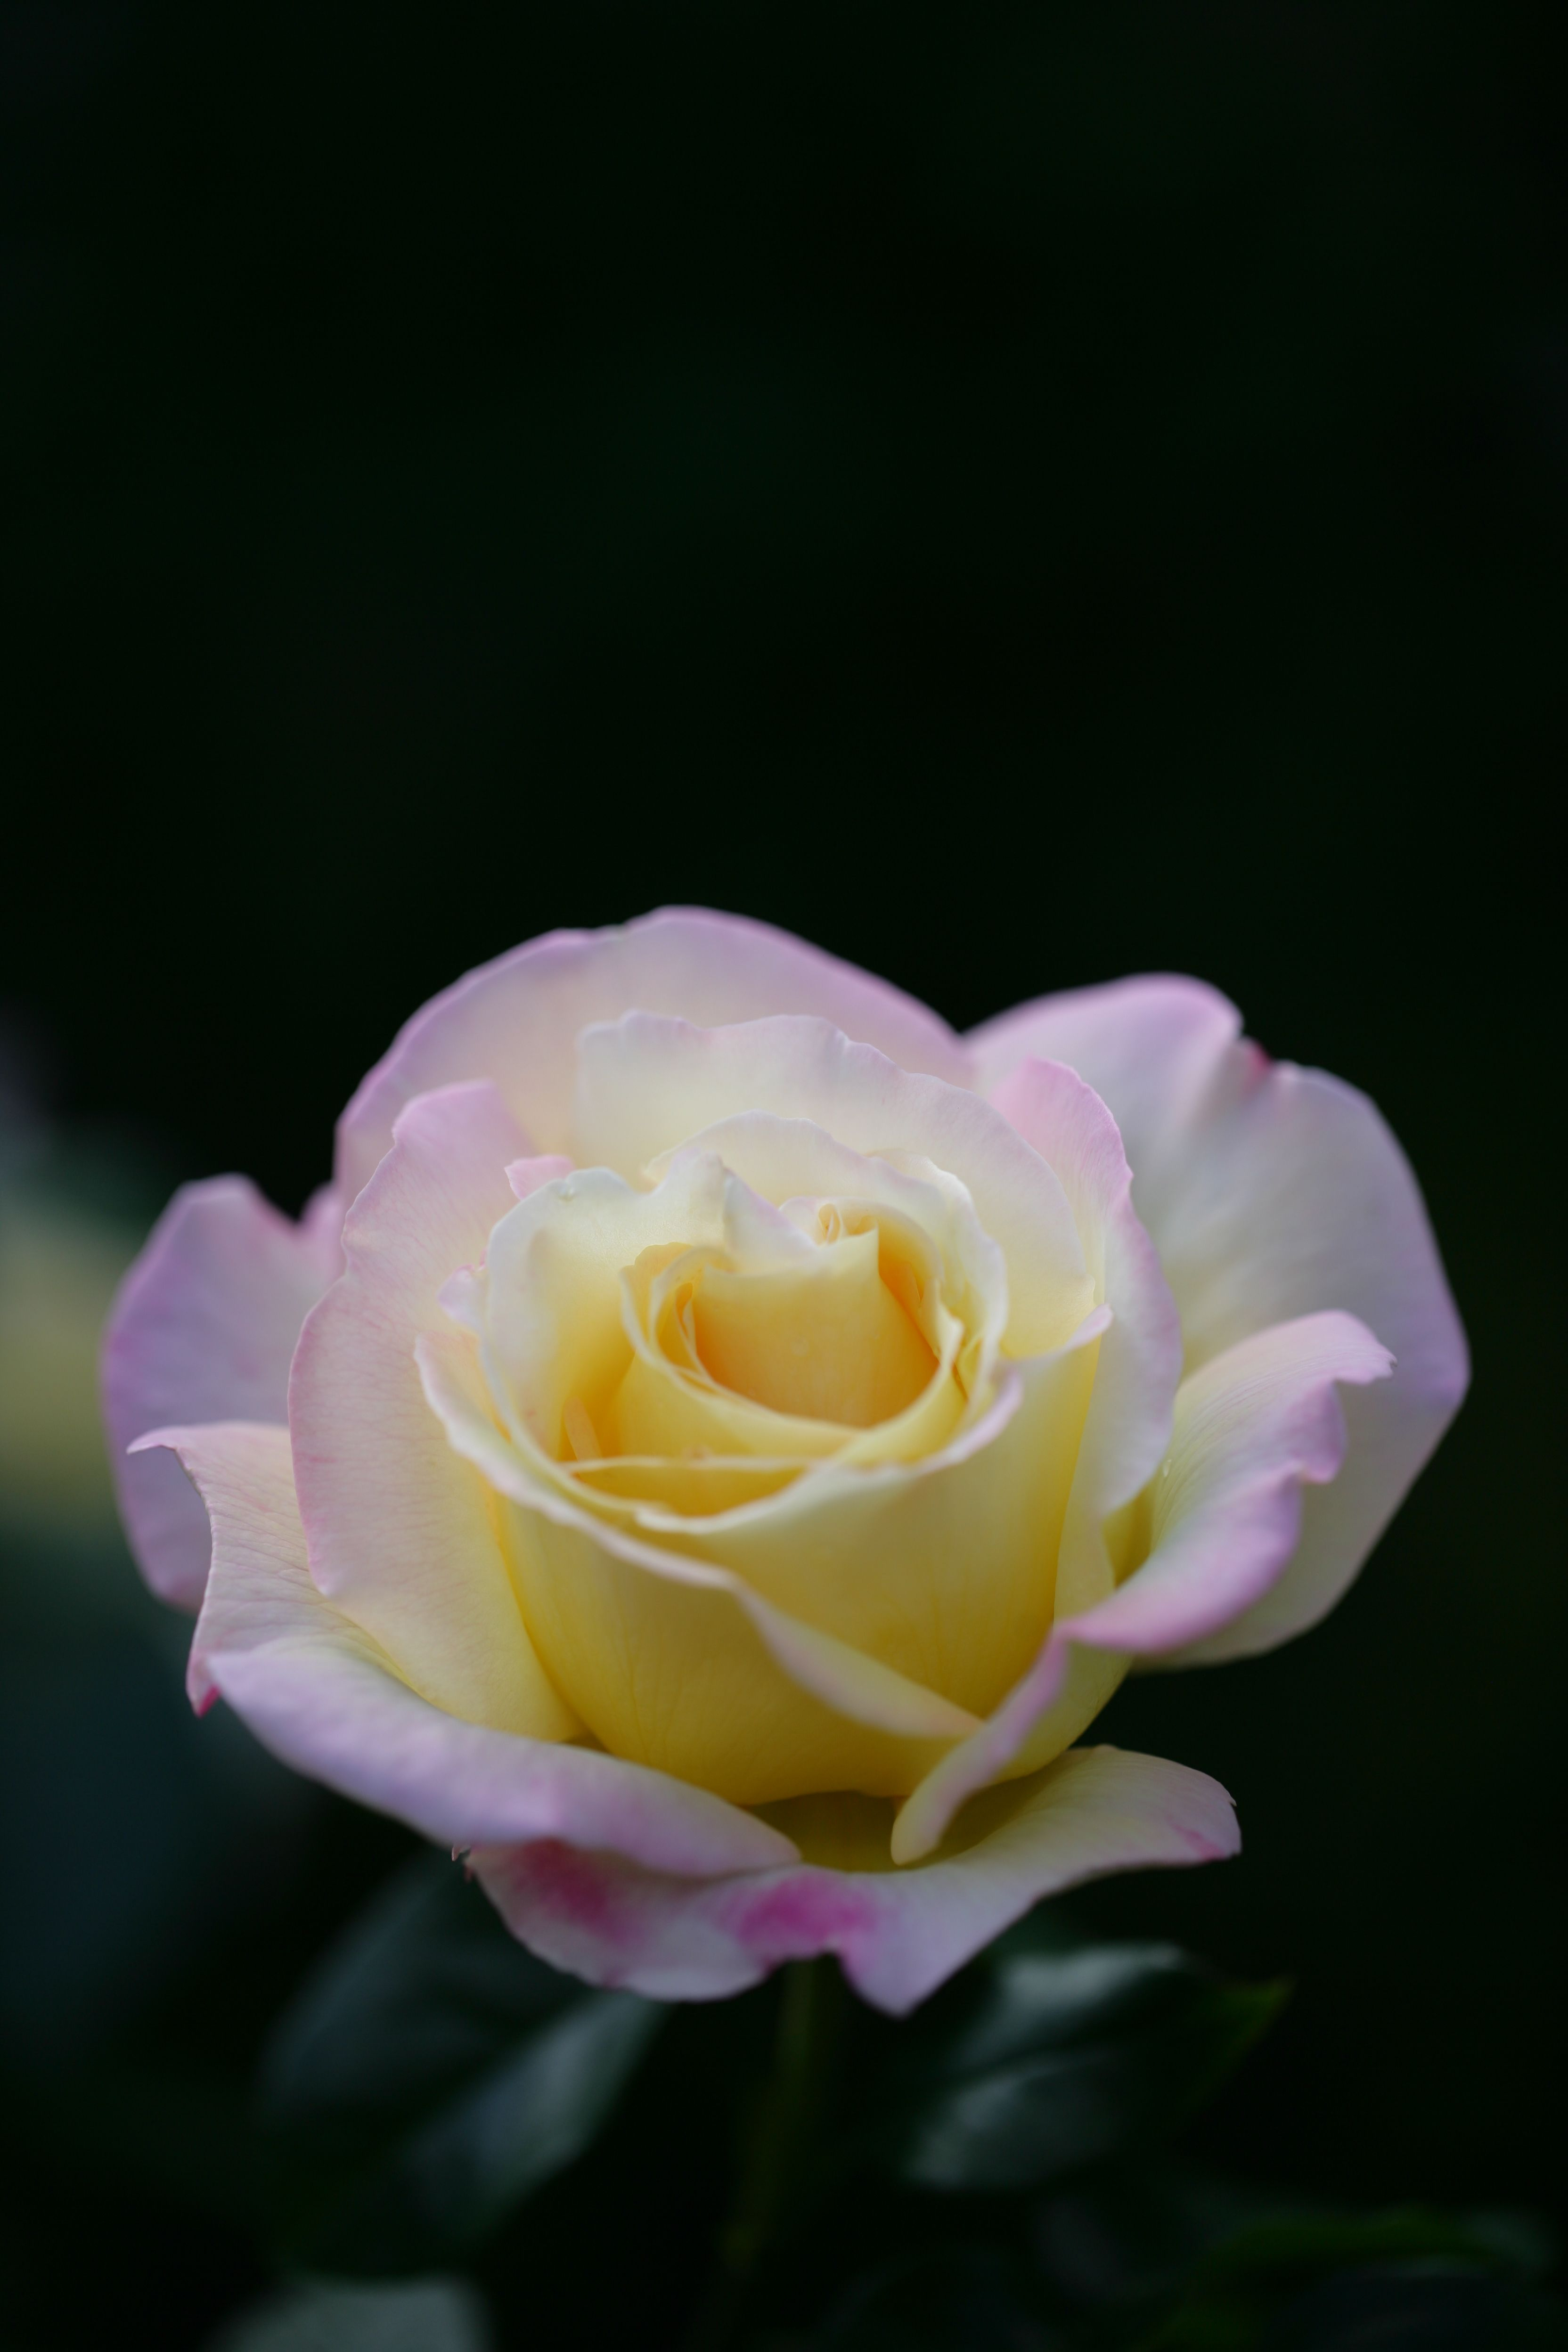 Pin by 📌 ️📌 Teresa Hughes 📌 ️📌 on ROSES II Flowers, Rose